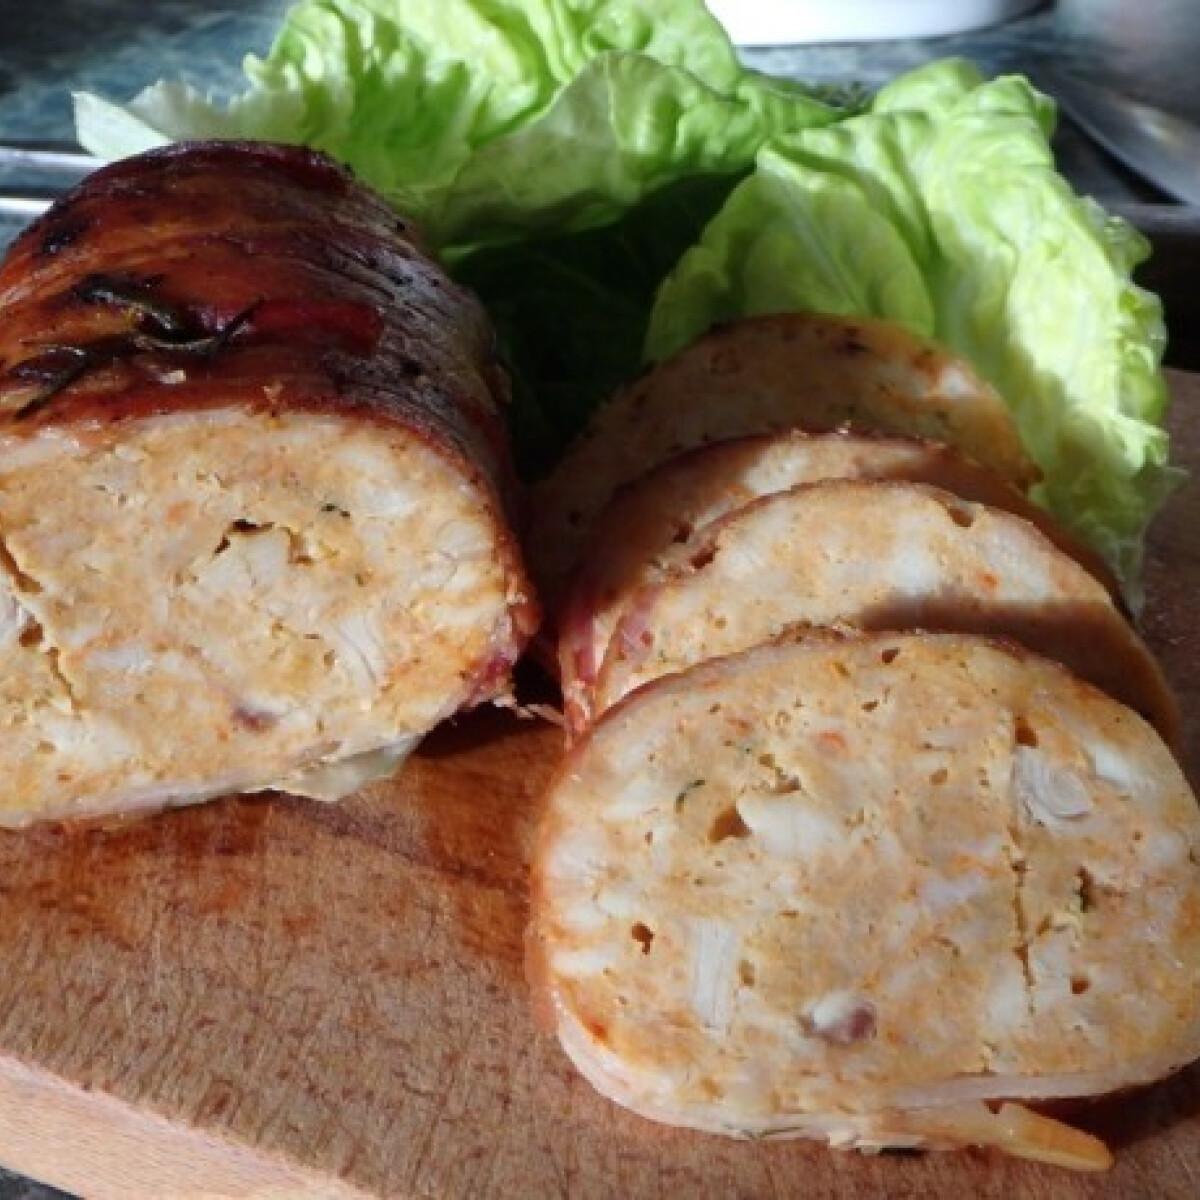 Baconbe göngyölt csirkemellvagdalt